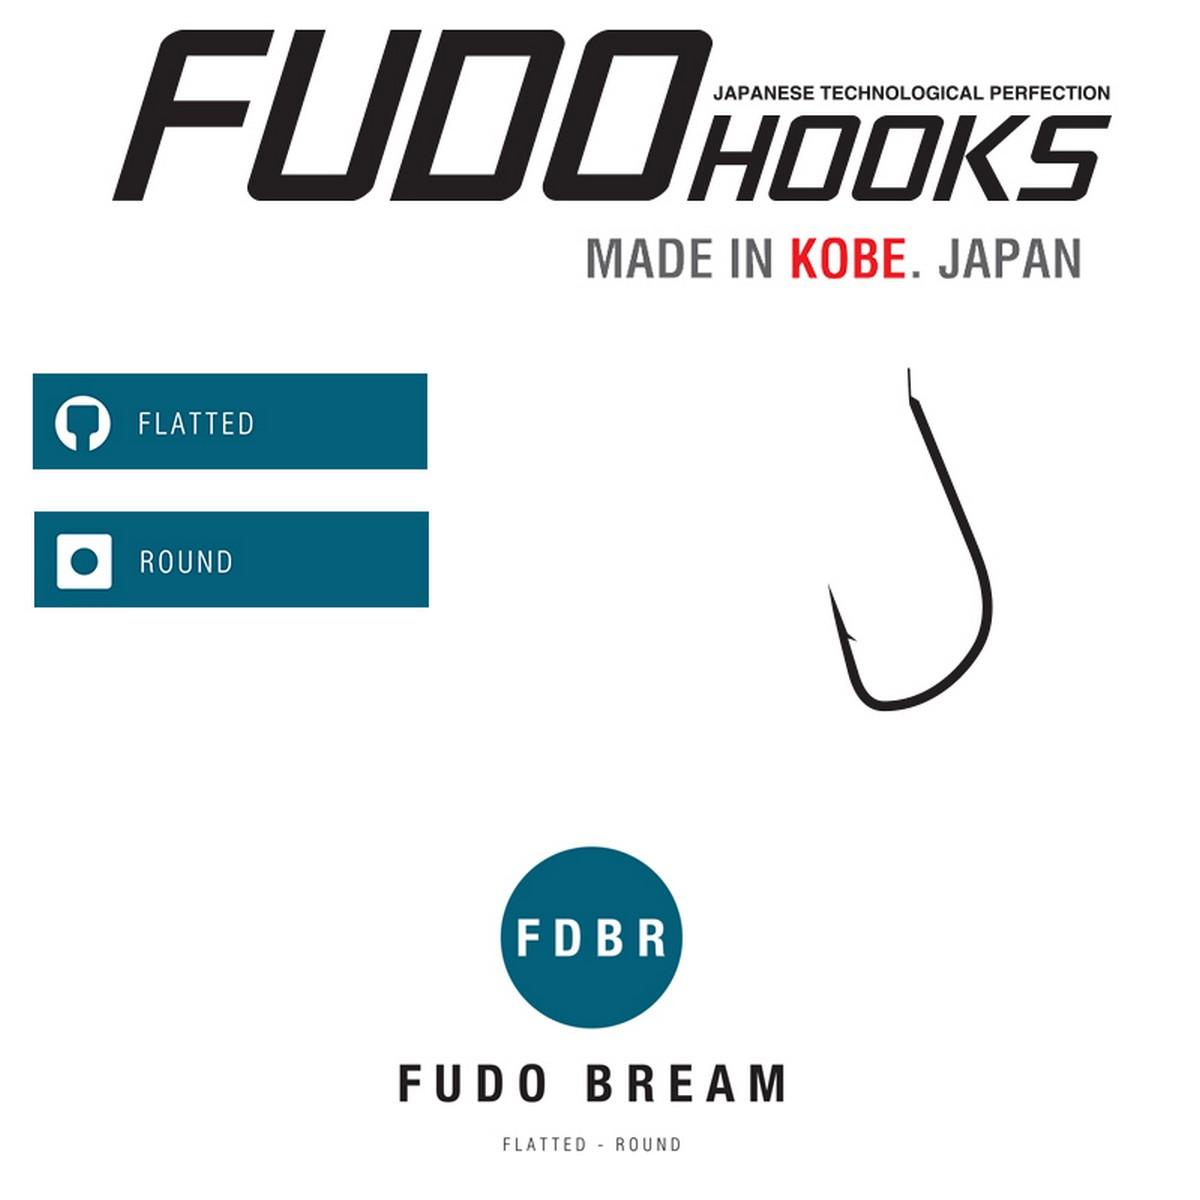 Куки FUDO BREAM (YAMAME) - BN3501